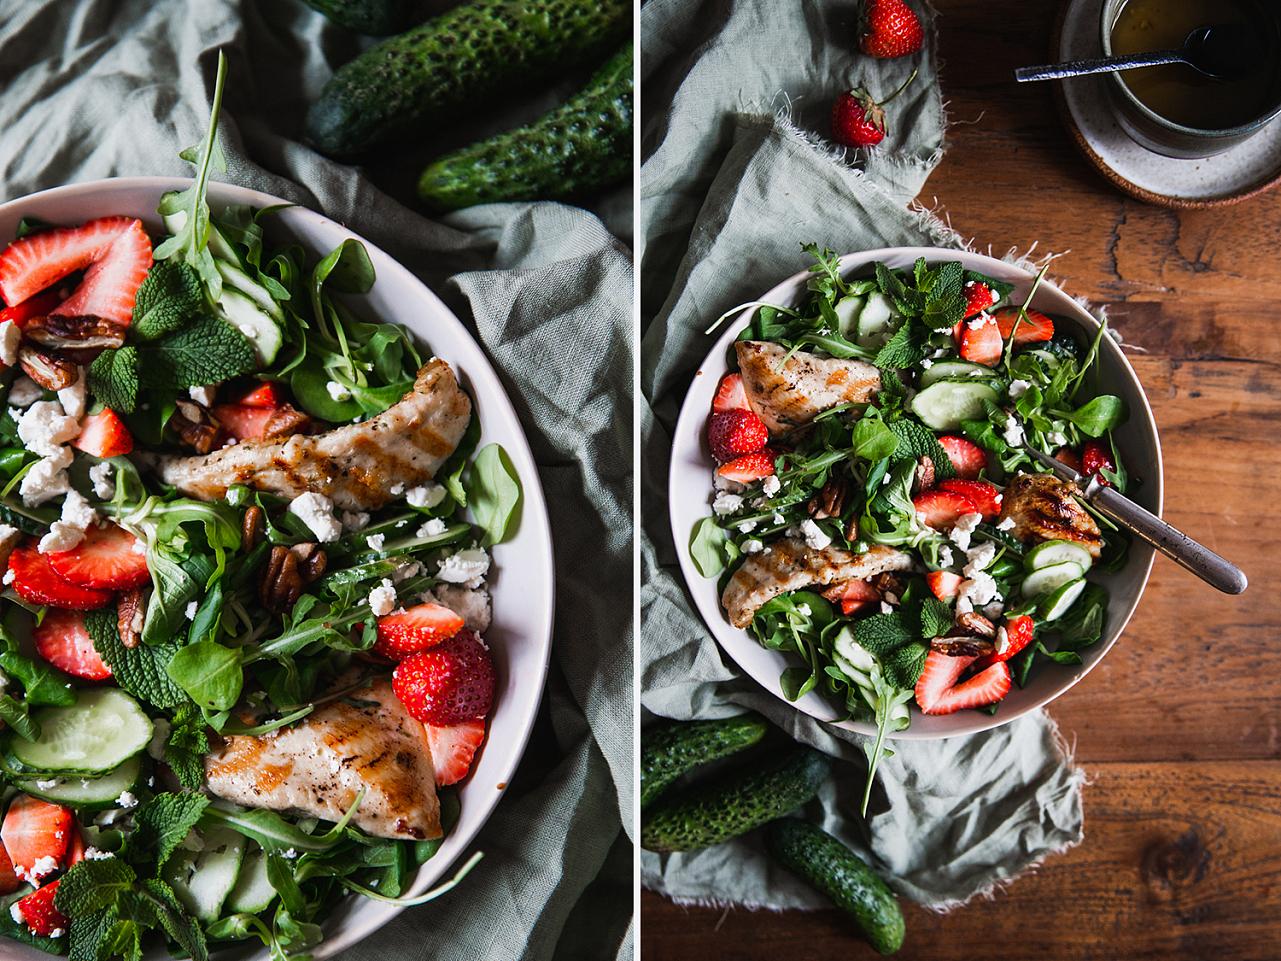 Letní salát s jahodami a fetou